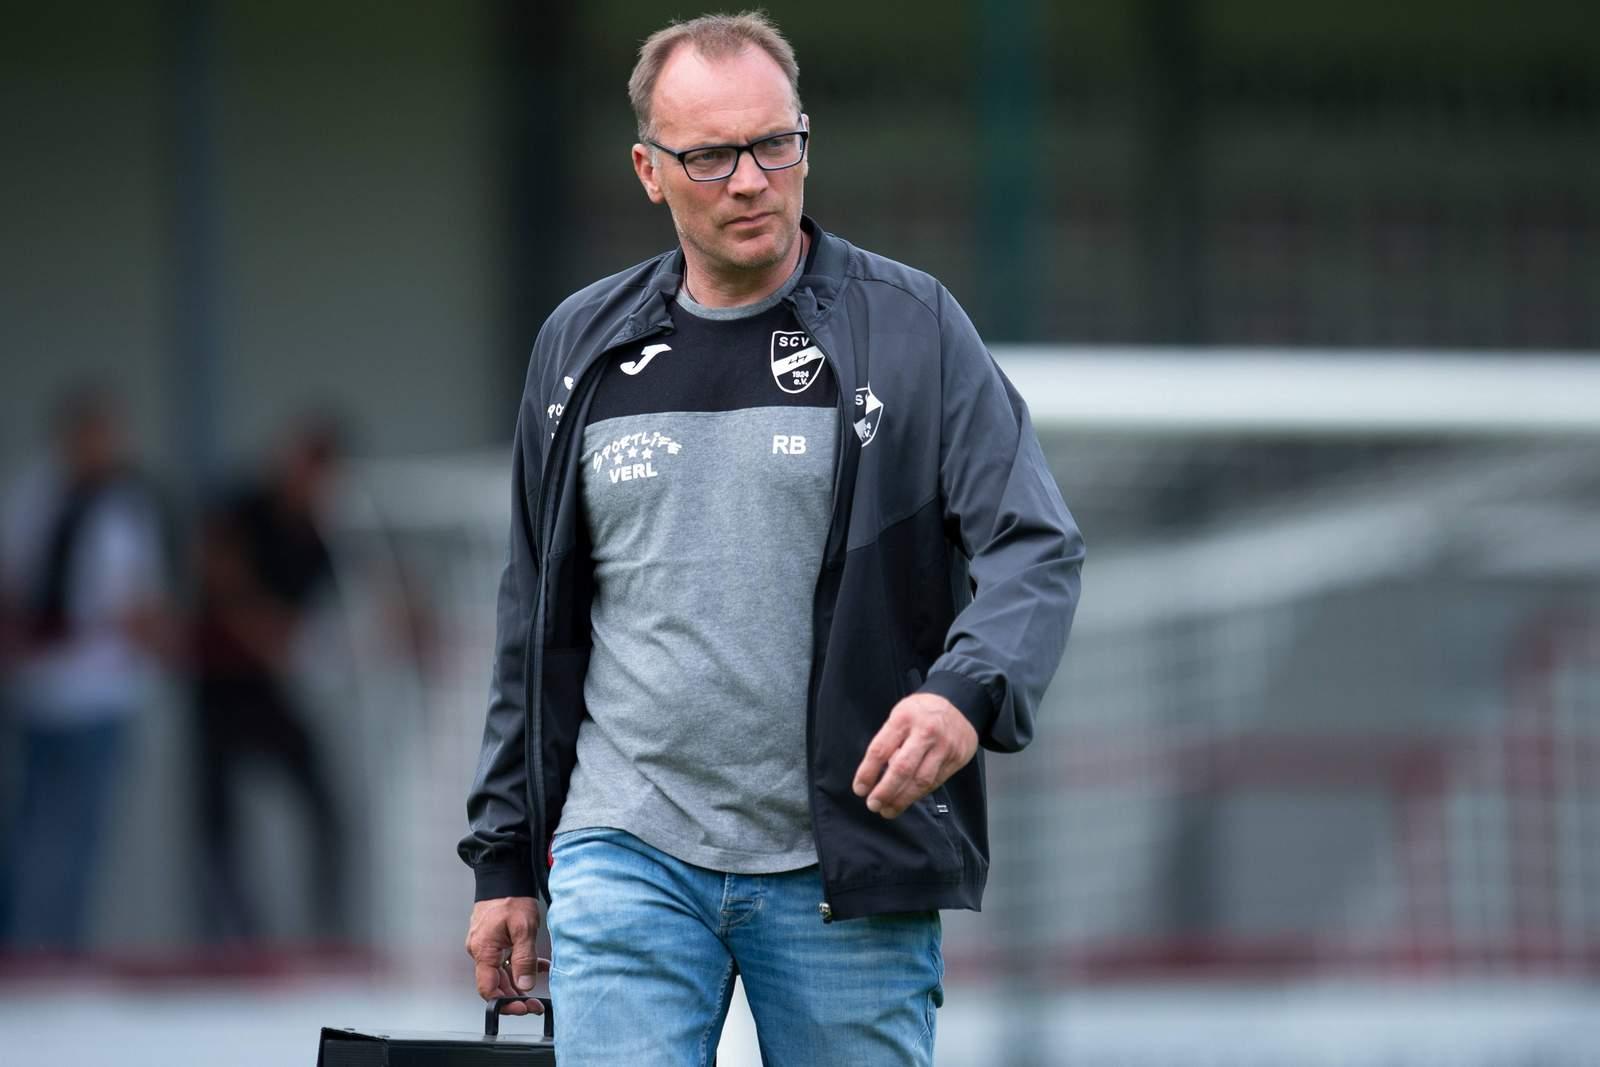 Raimund Bertels vom SC Verl